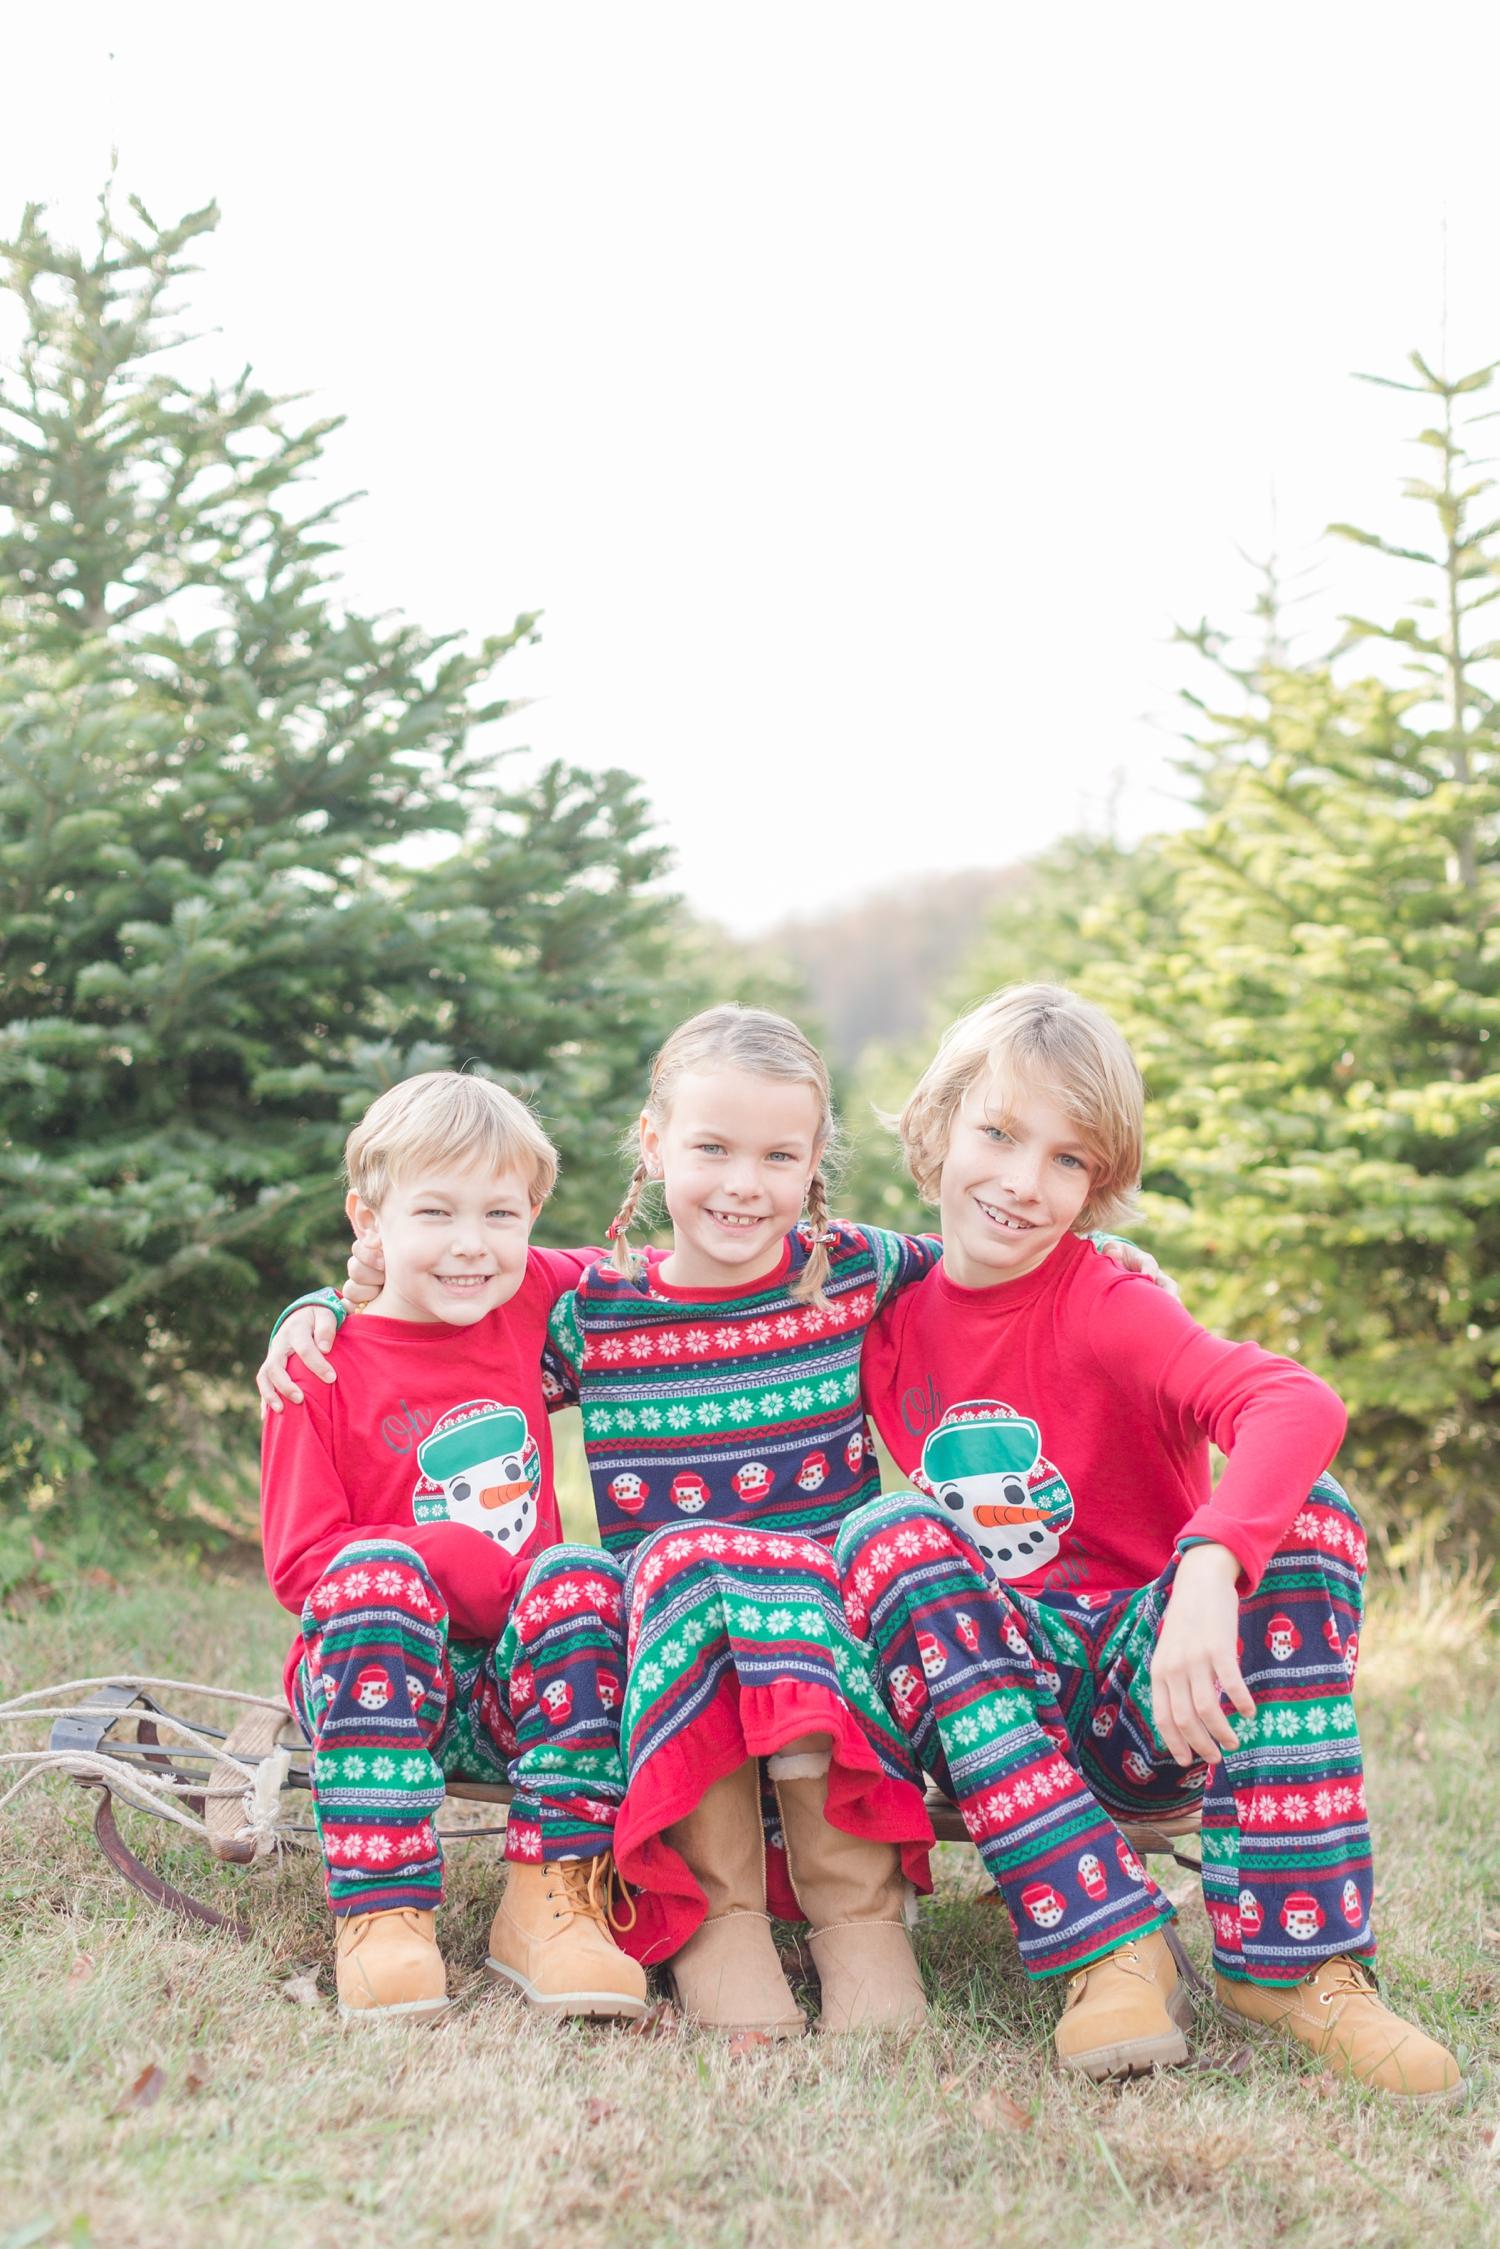 Golembiesky Family 2017-2_ruhl-tree-farm-baltimore-maryland-family-photography-anna-grace-photography-photo.jpg